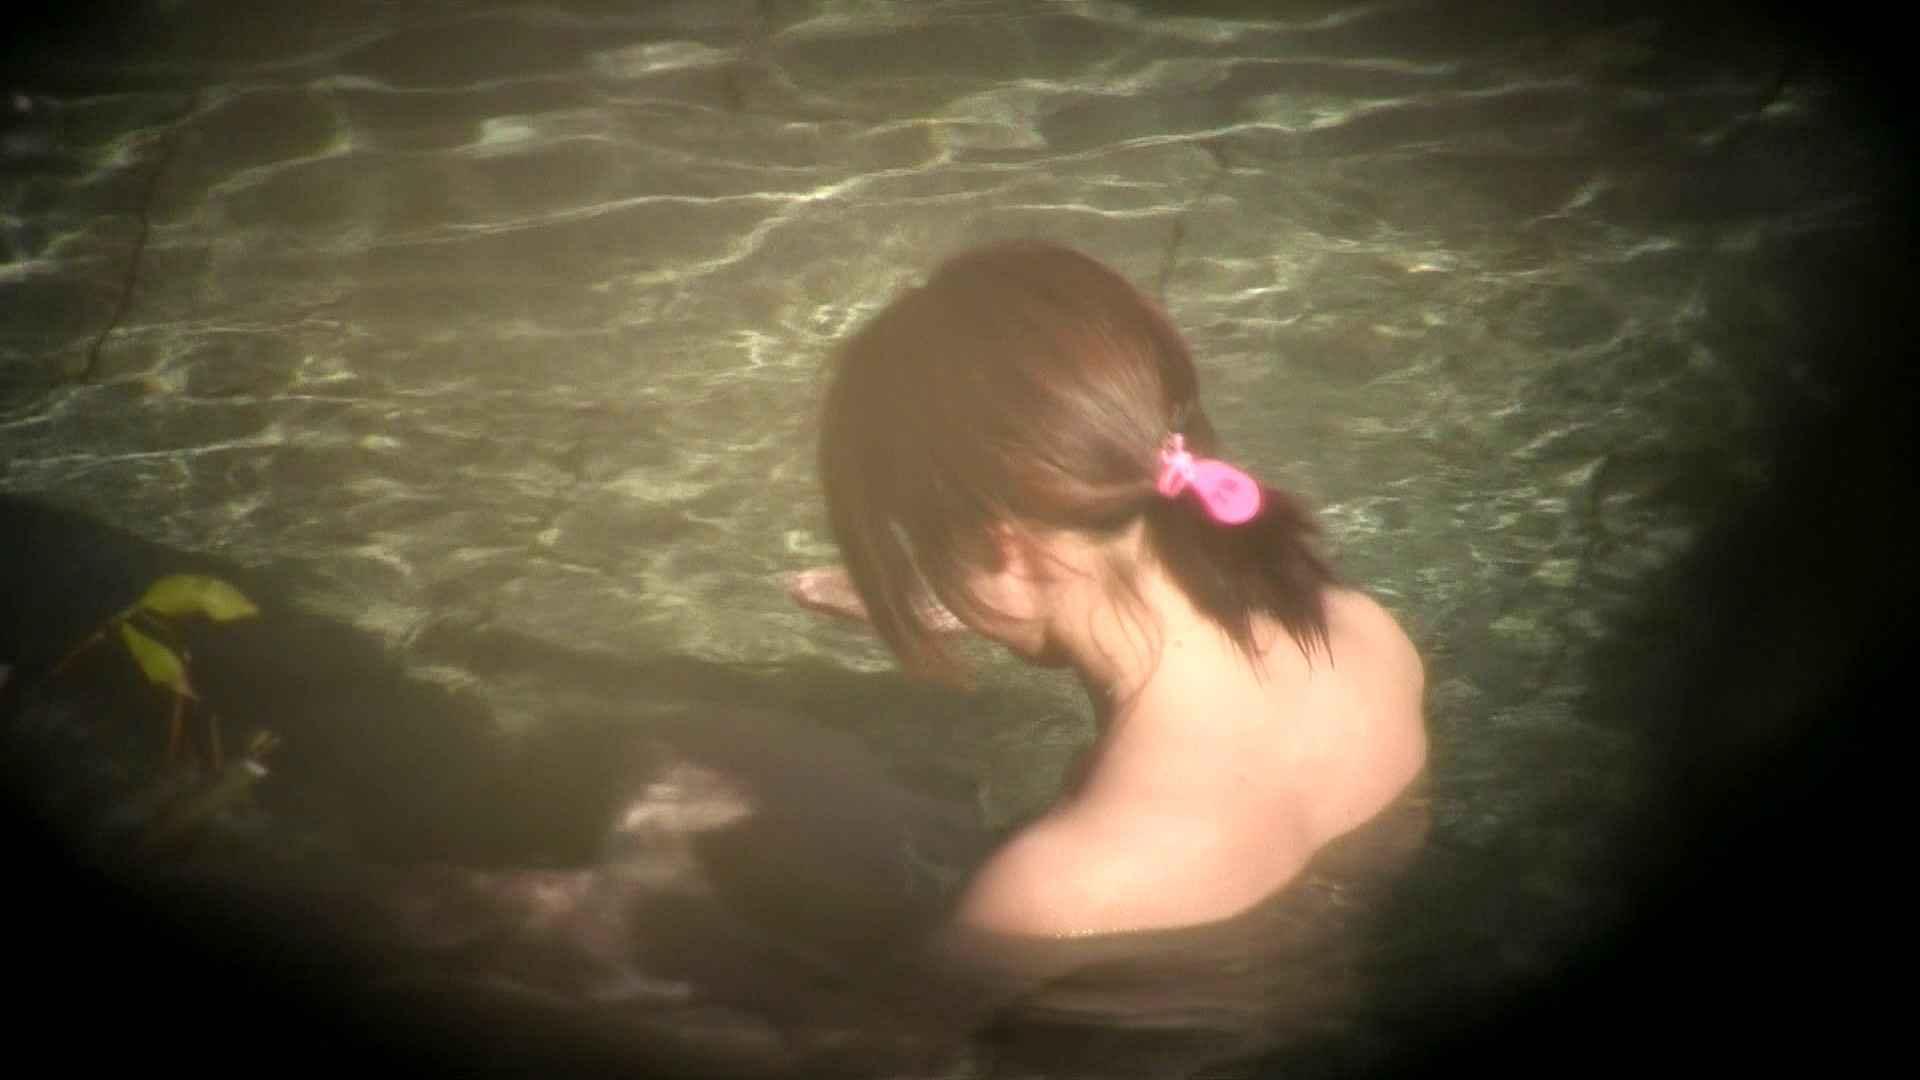 Aquaな露天風呂Vol.698 盗撮 | HなOL  86pic 40